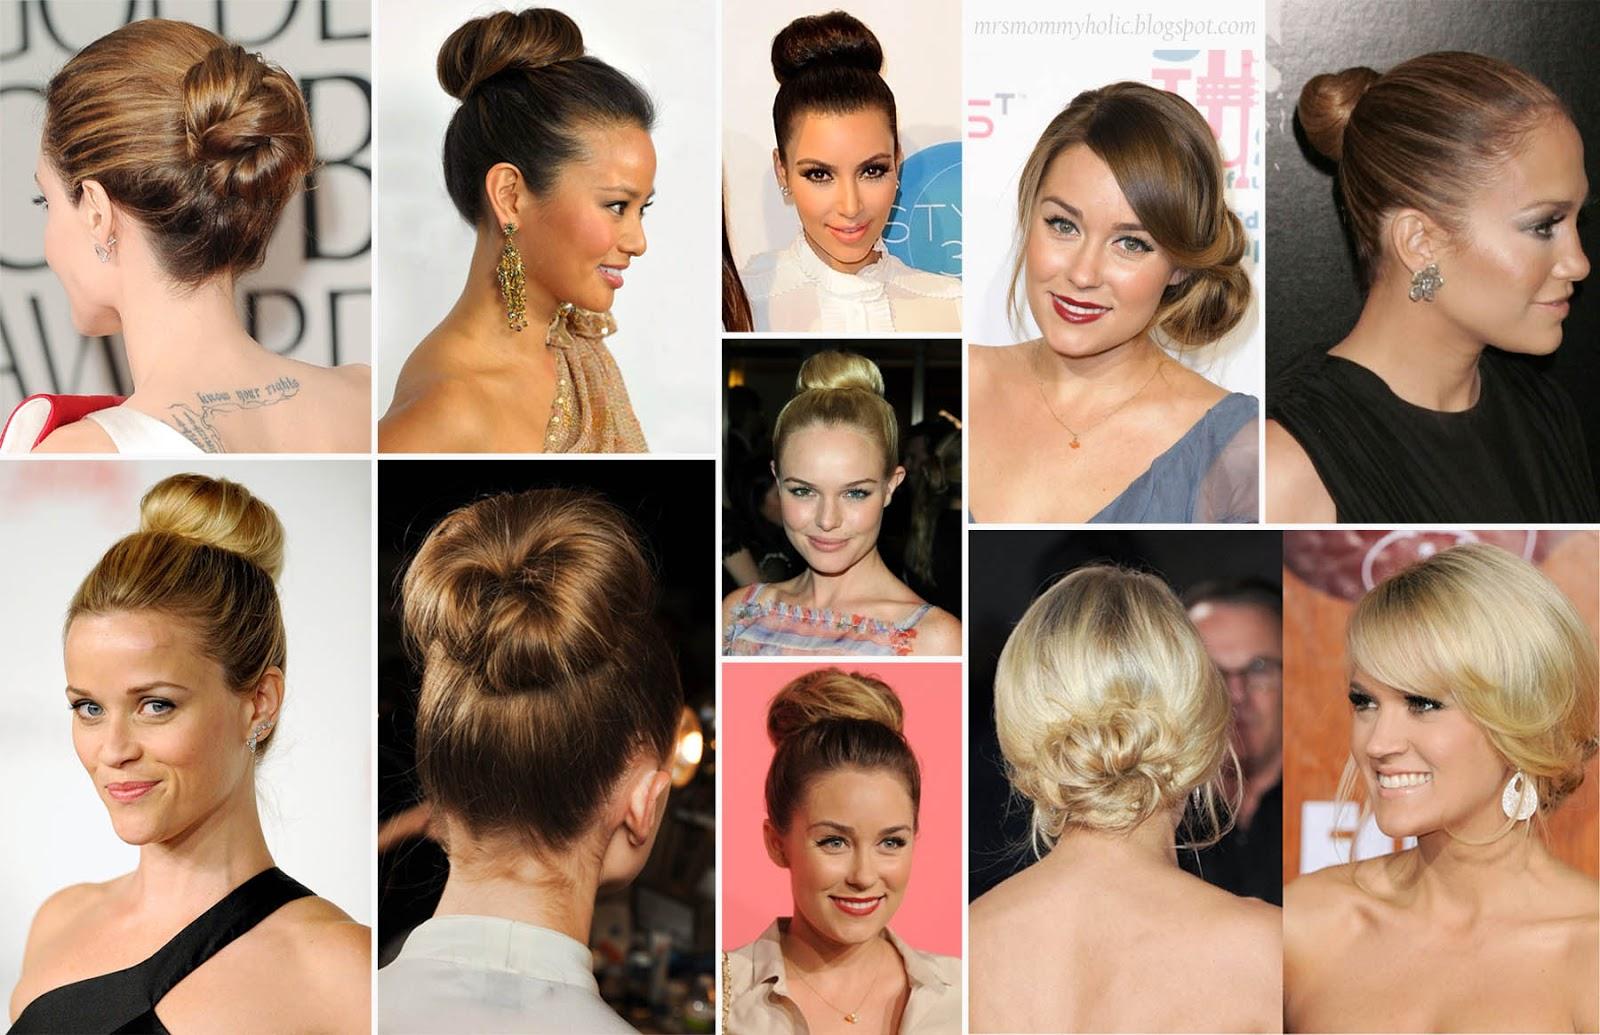 MrsMommyHolic: Easiest Hairstyle Ever: The Donut Bun